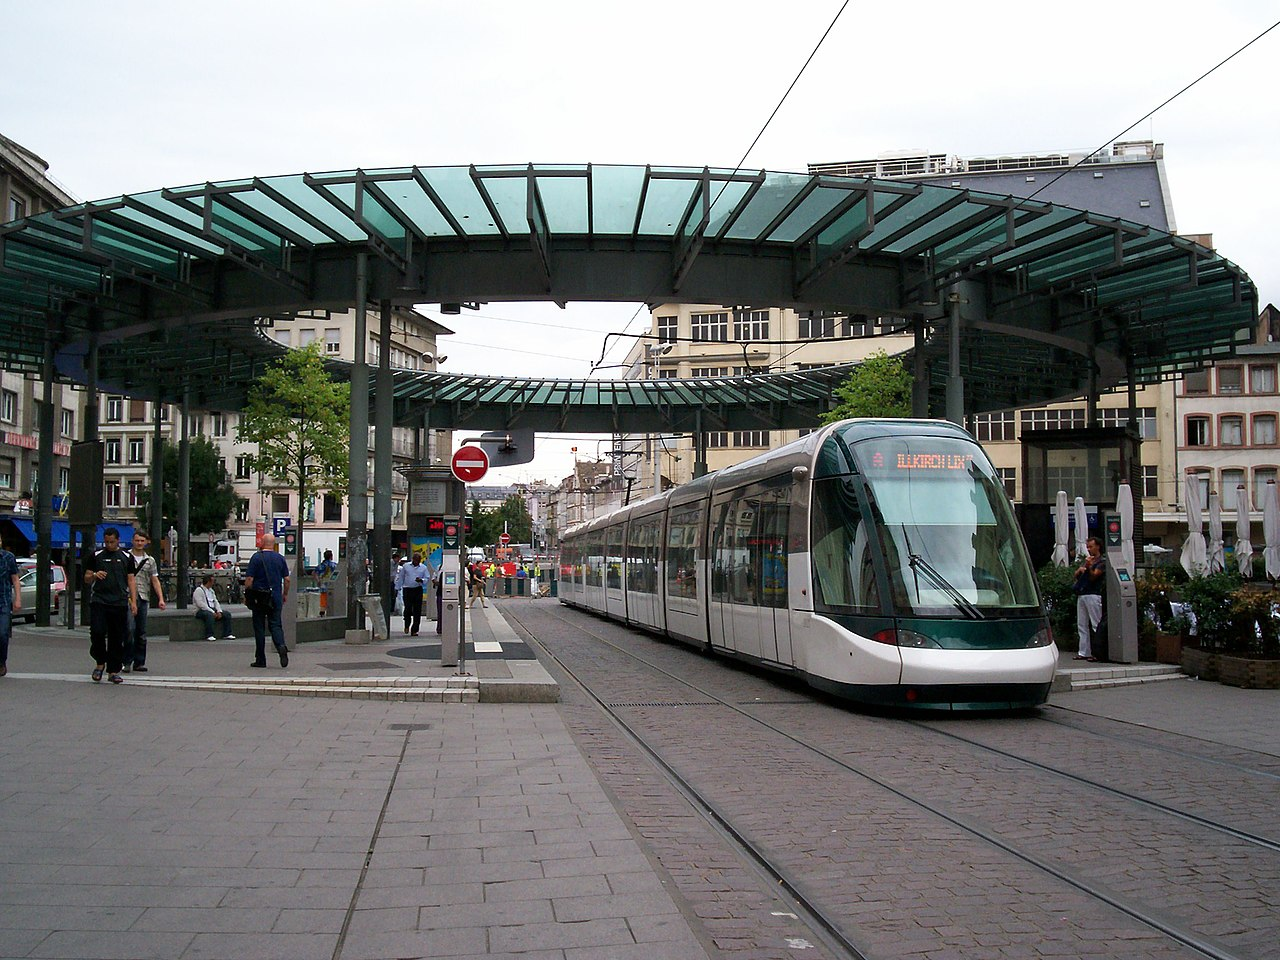 Tranvía de Estrasburgo en HommedeFer